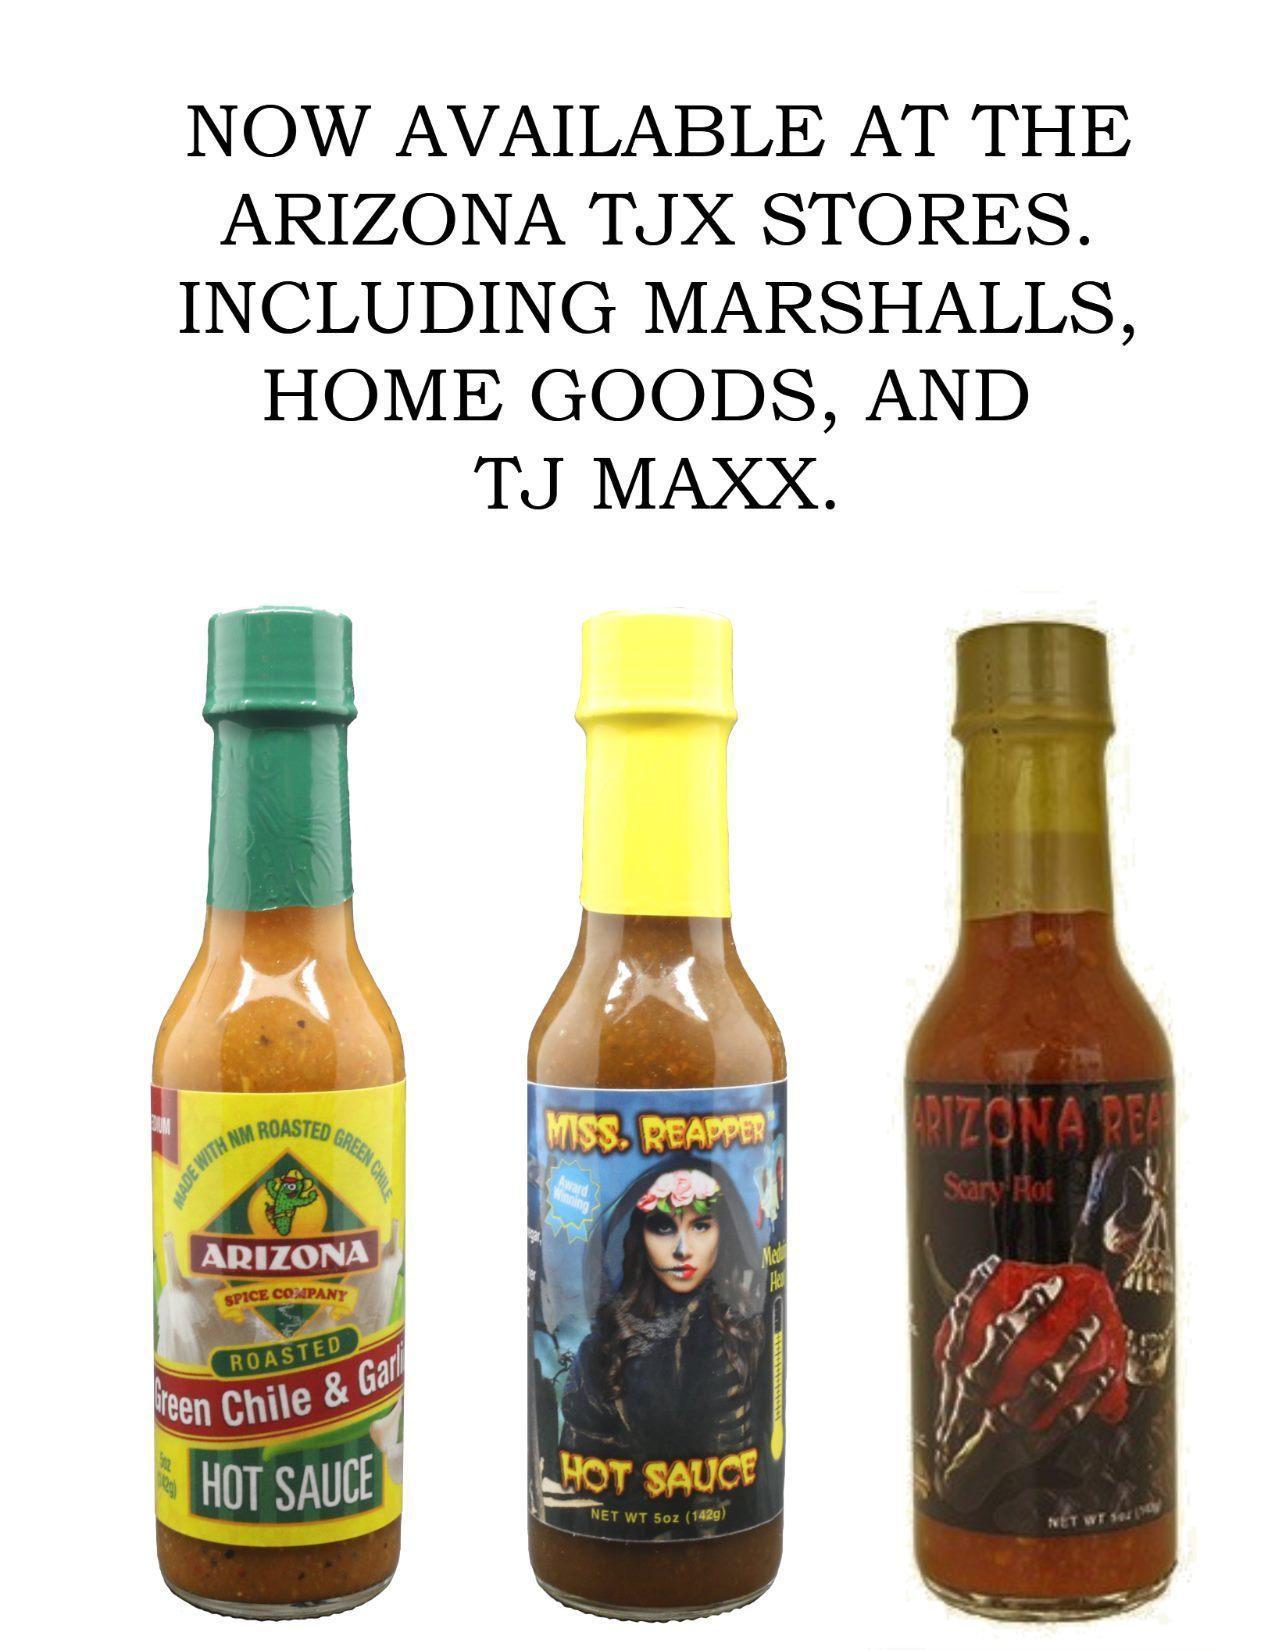 Arizona Salsa and Spice Co image 18